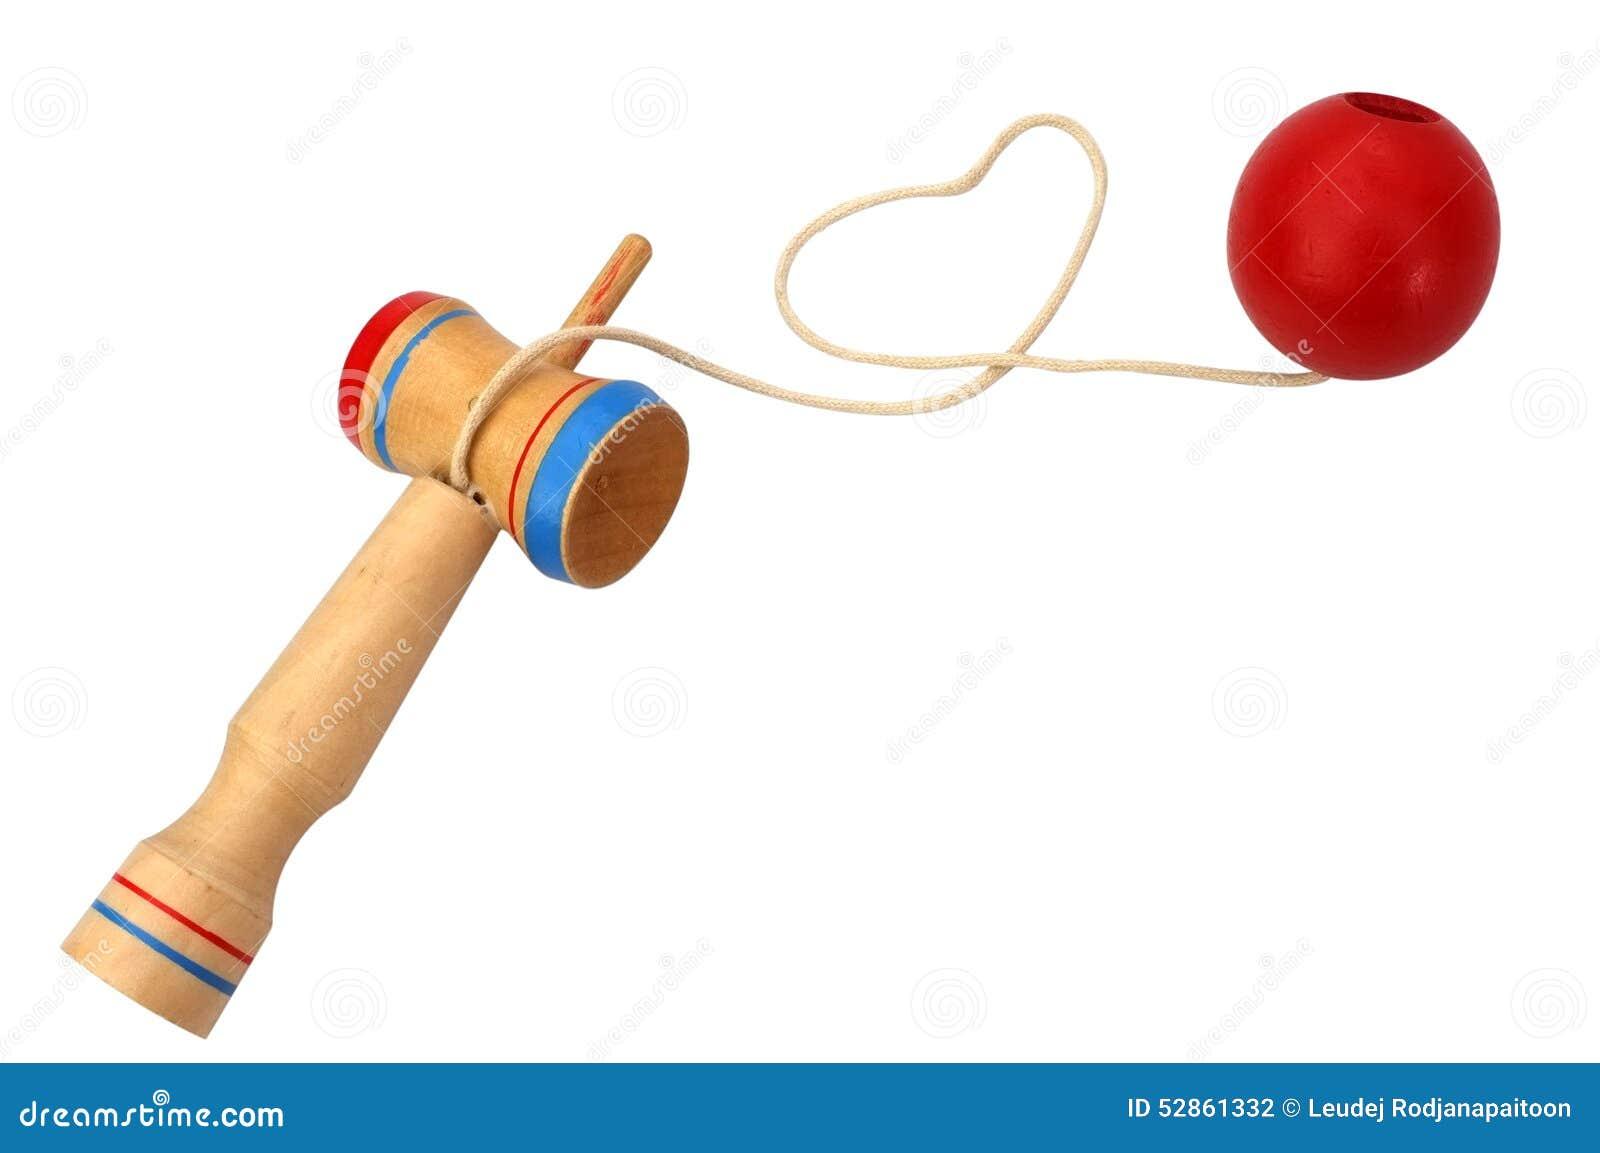 Kendama,包括剑和球的一个传统日本玩具连接由串在心脏形状滚动了